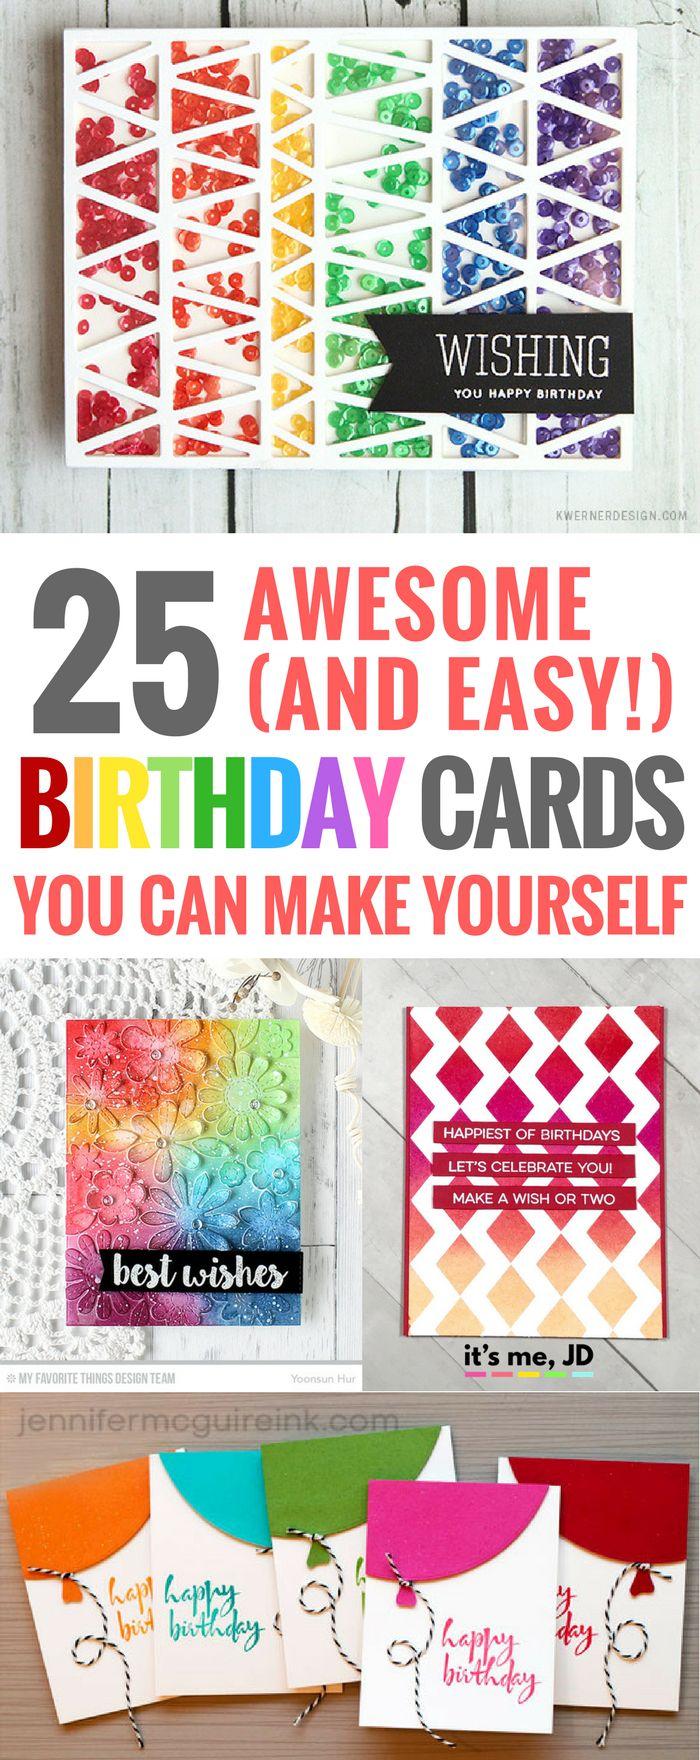 Best 25 Easy diy birthday cards ideas – Birthday Cards You Can Make